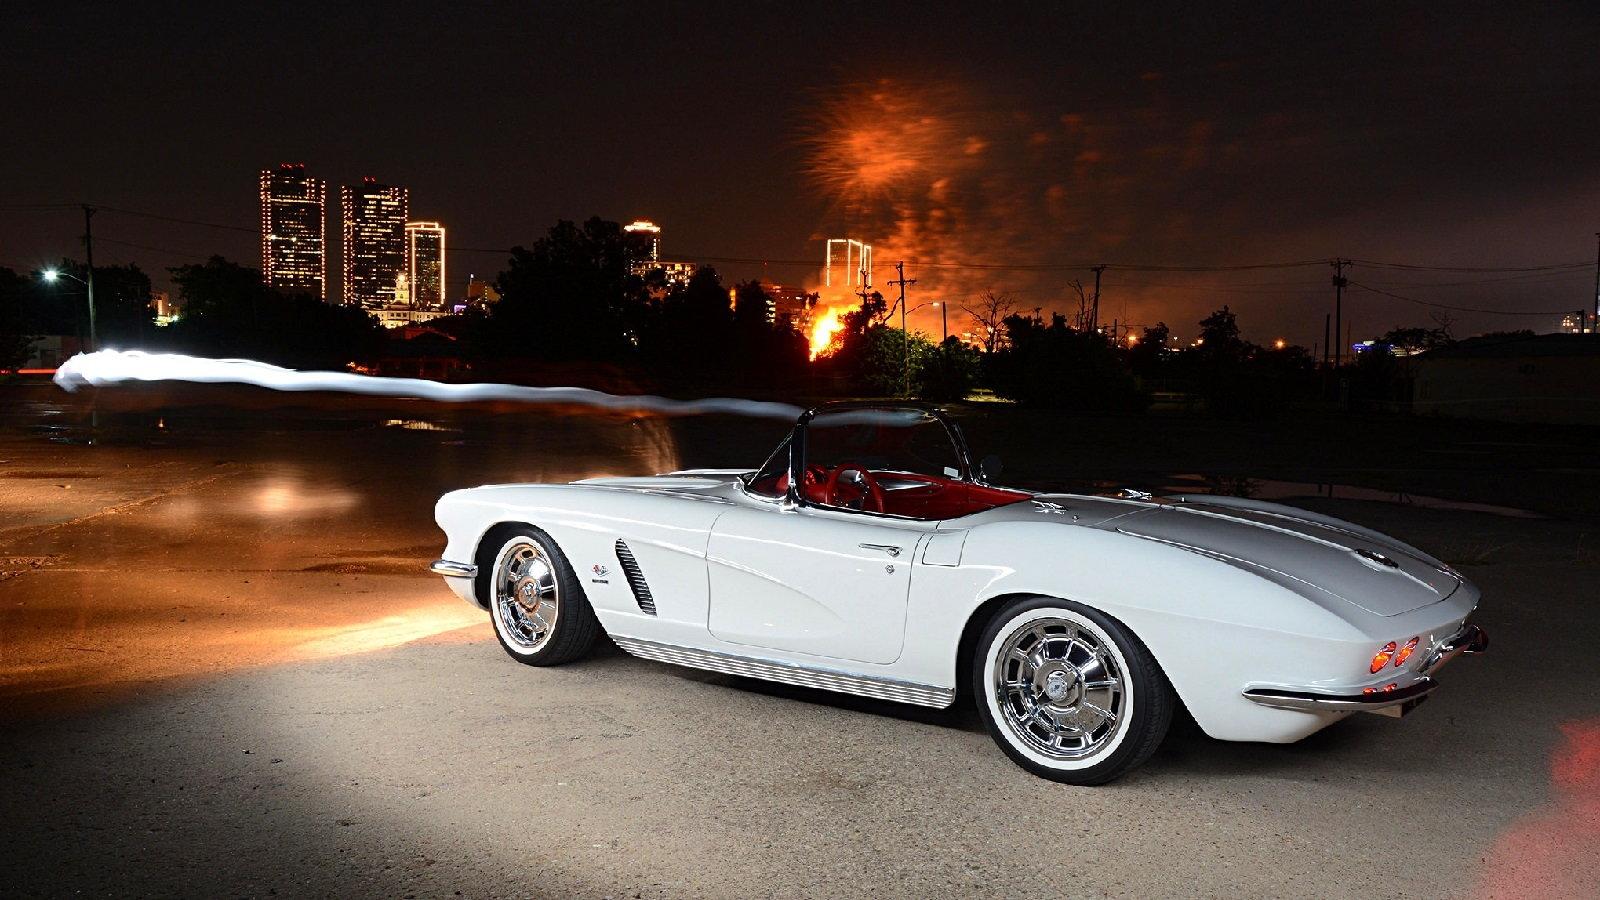 62 Corvette Got More than a Restoration